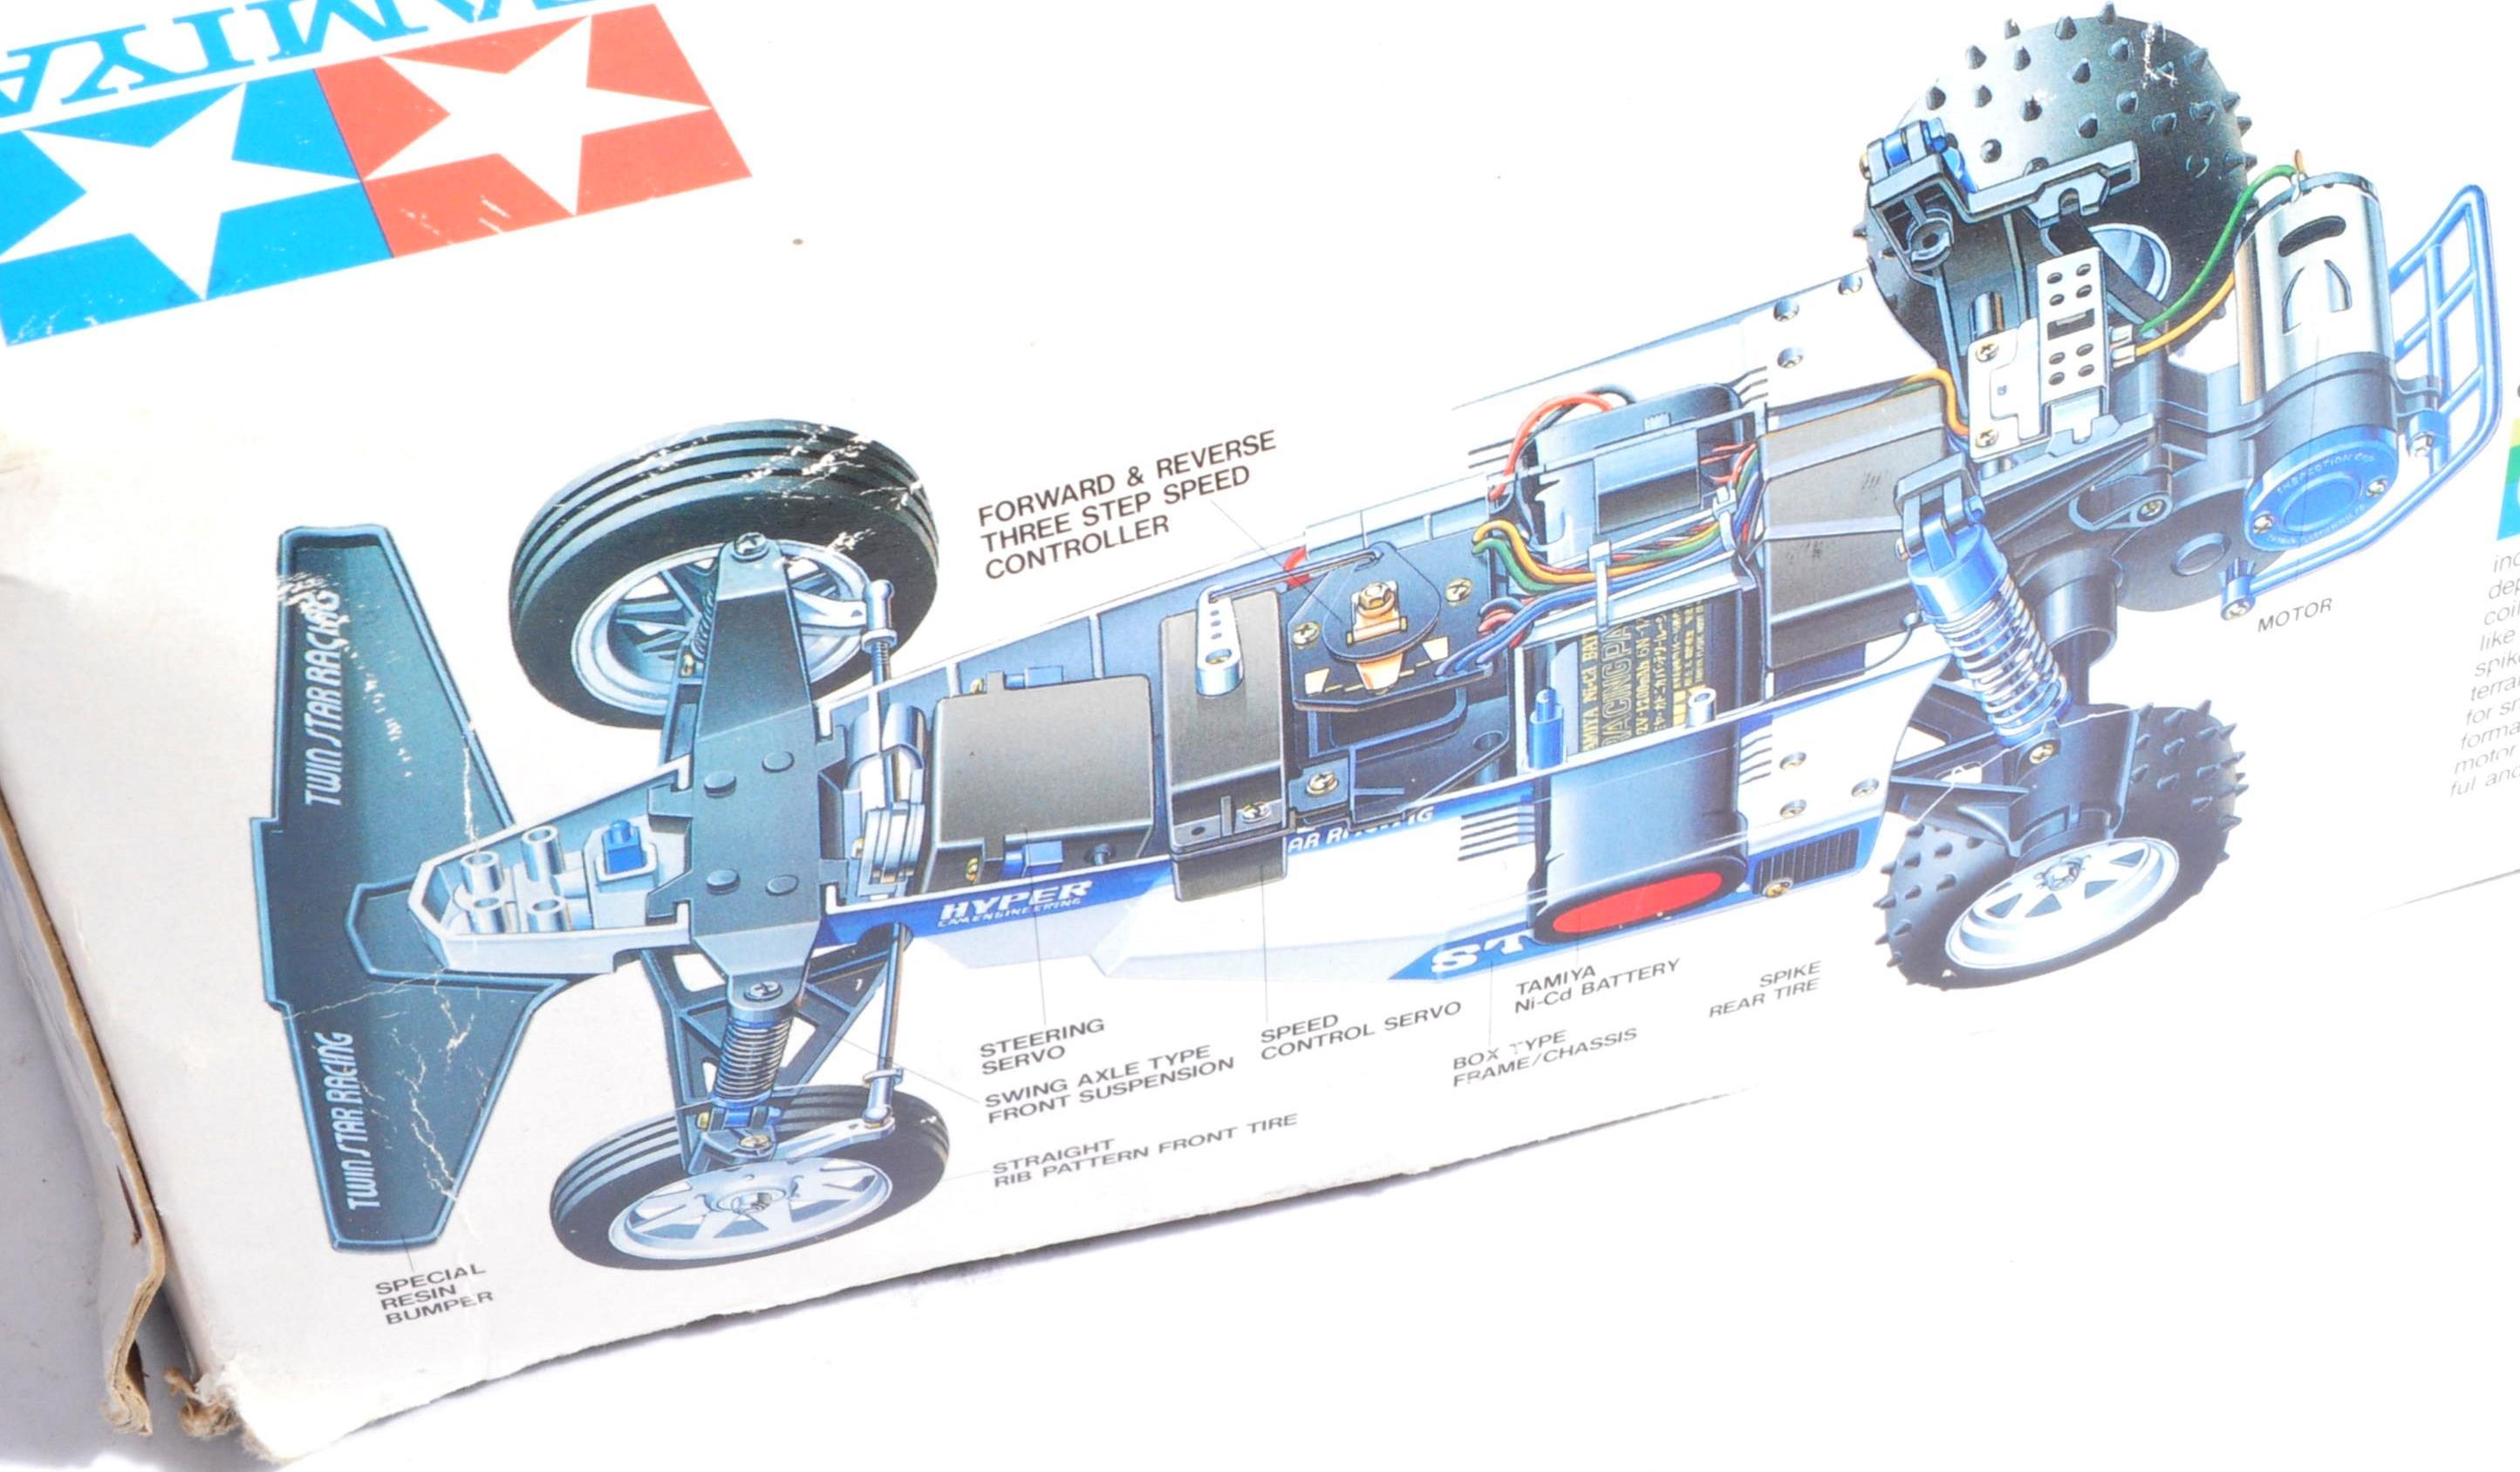 TAMIYA - SCARCE VINTAGE 1/10TH SCALE ' STRIKER ' RC CAR - Image 4 of 6